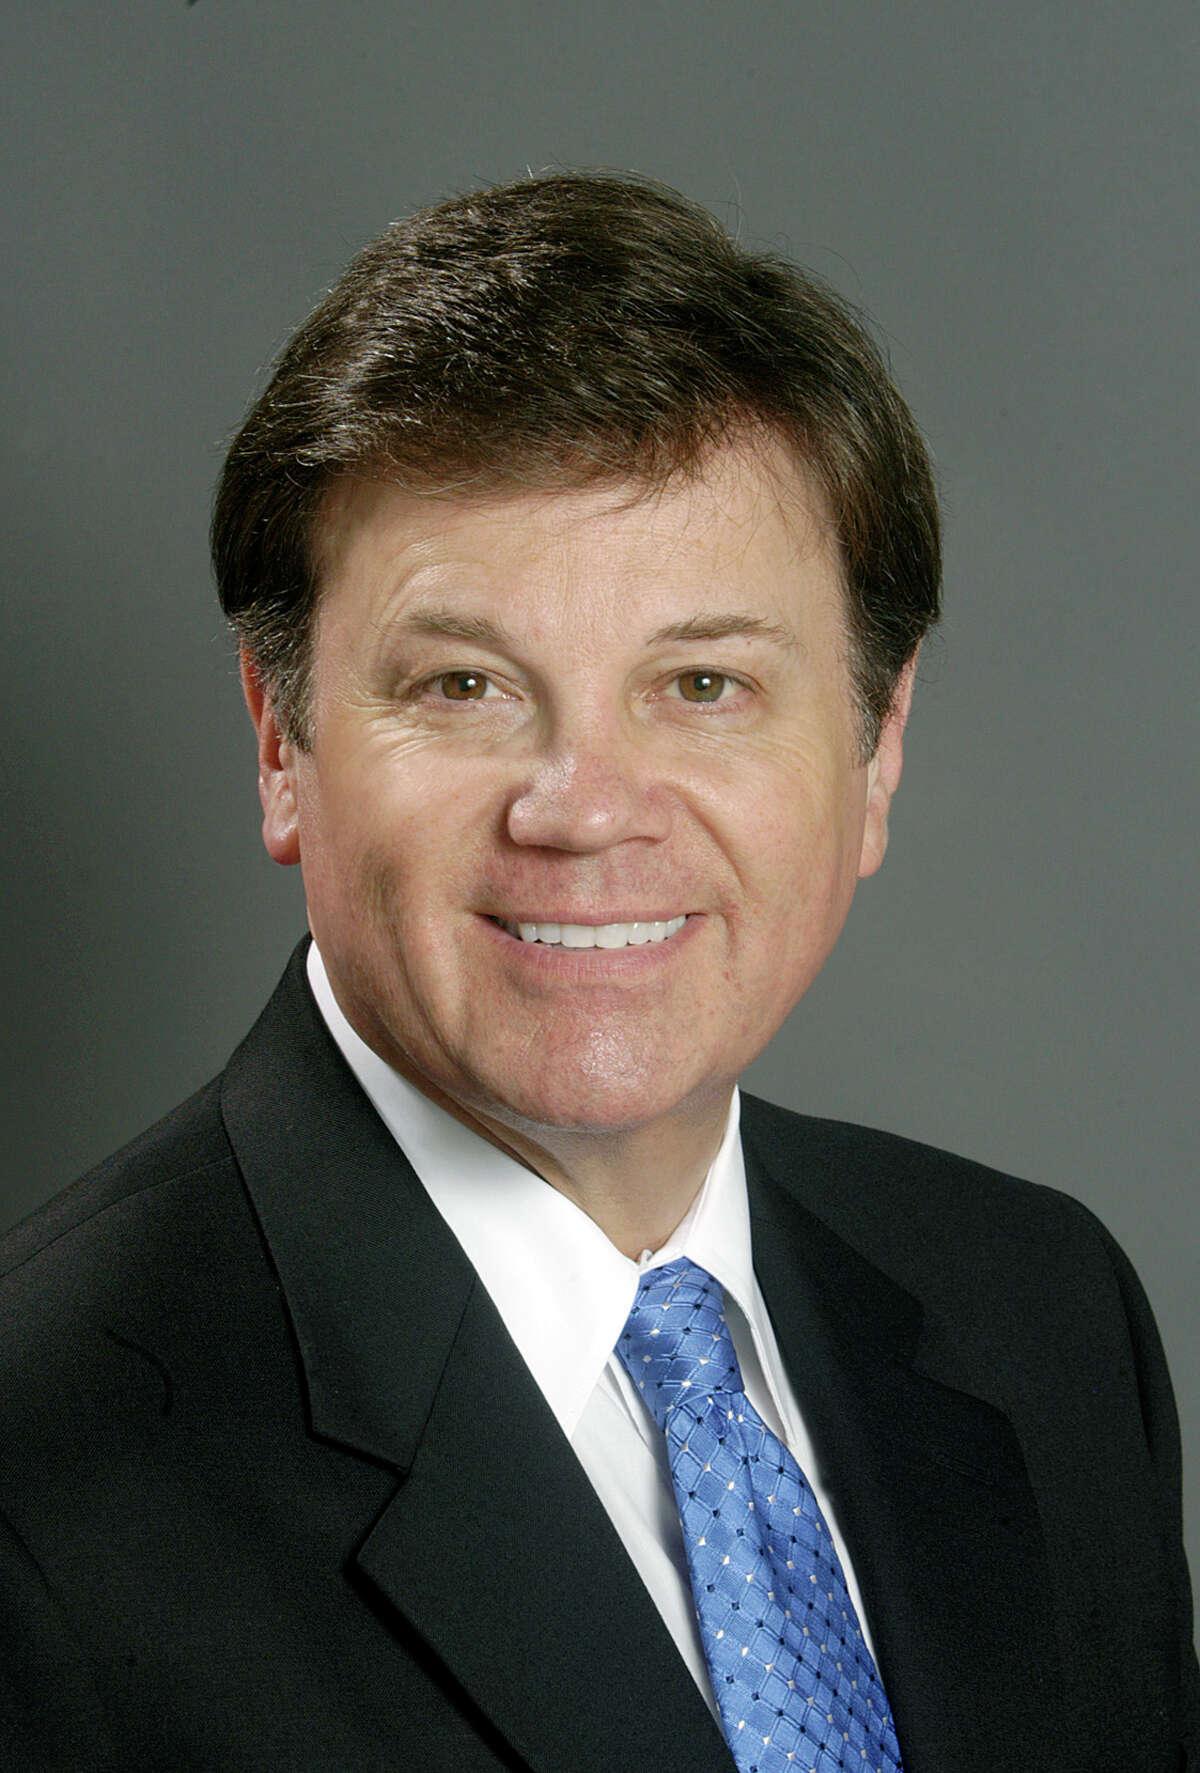 Dr. William Glass, deputy superintendent of Danbury Public Schools